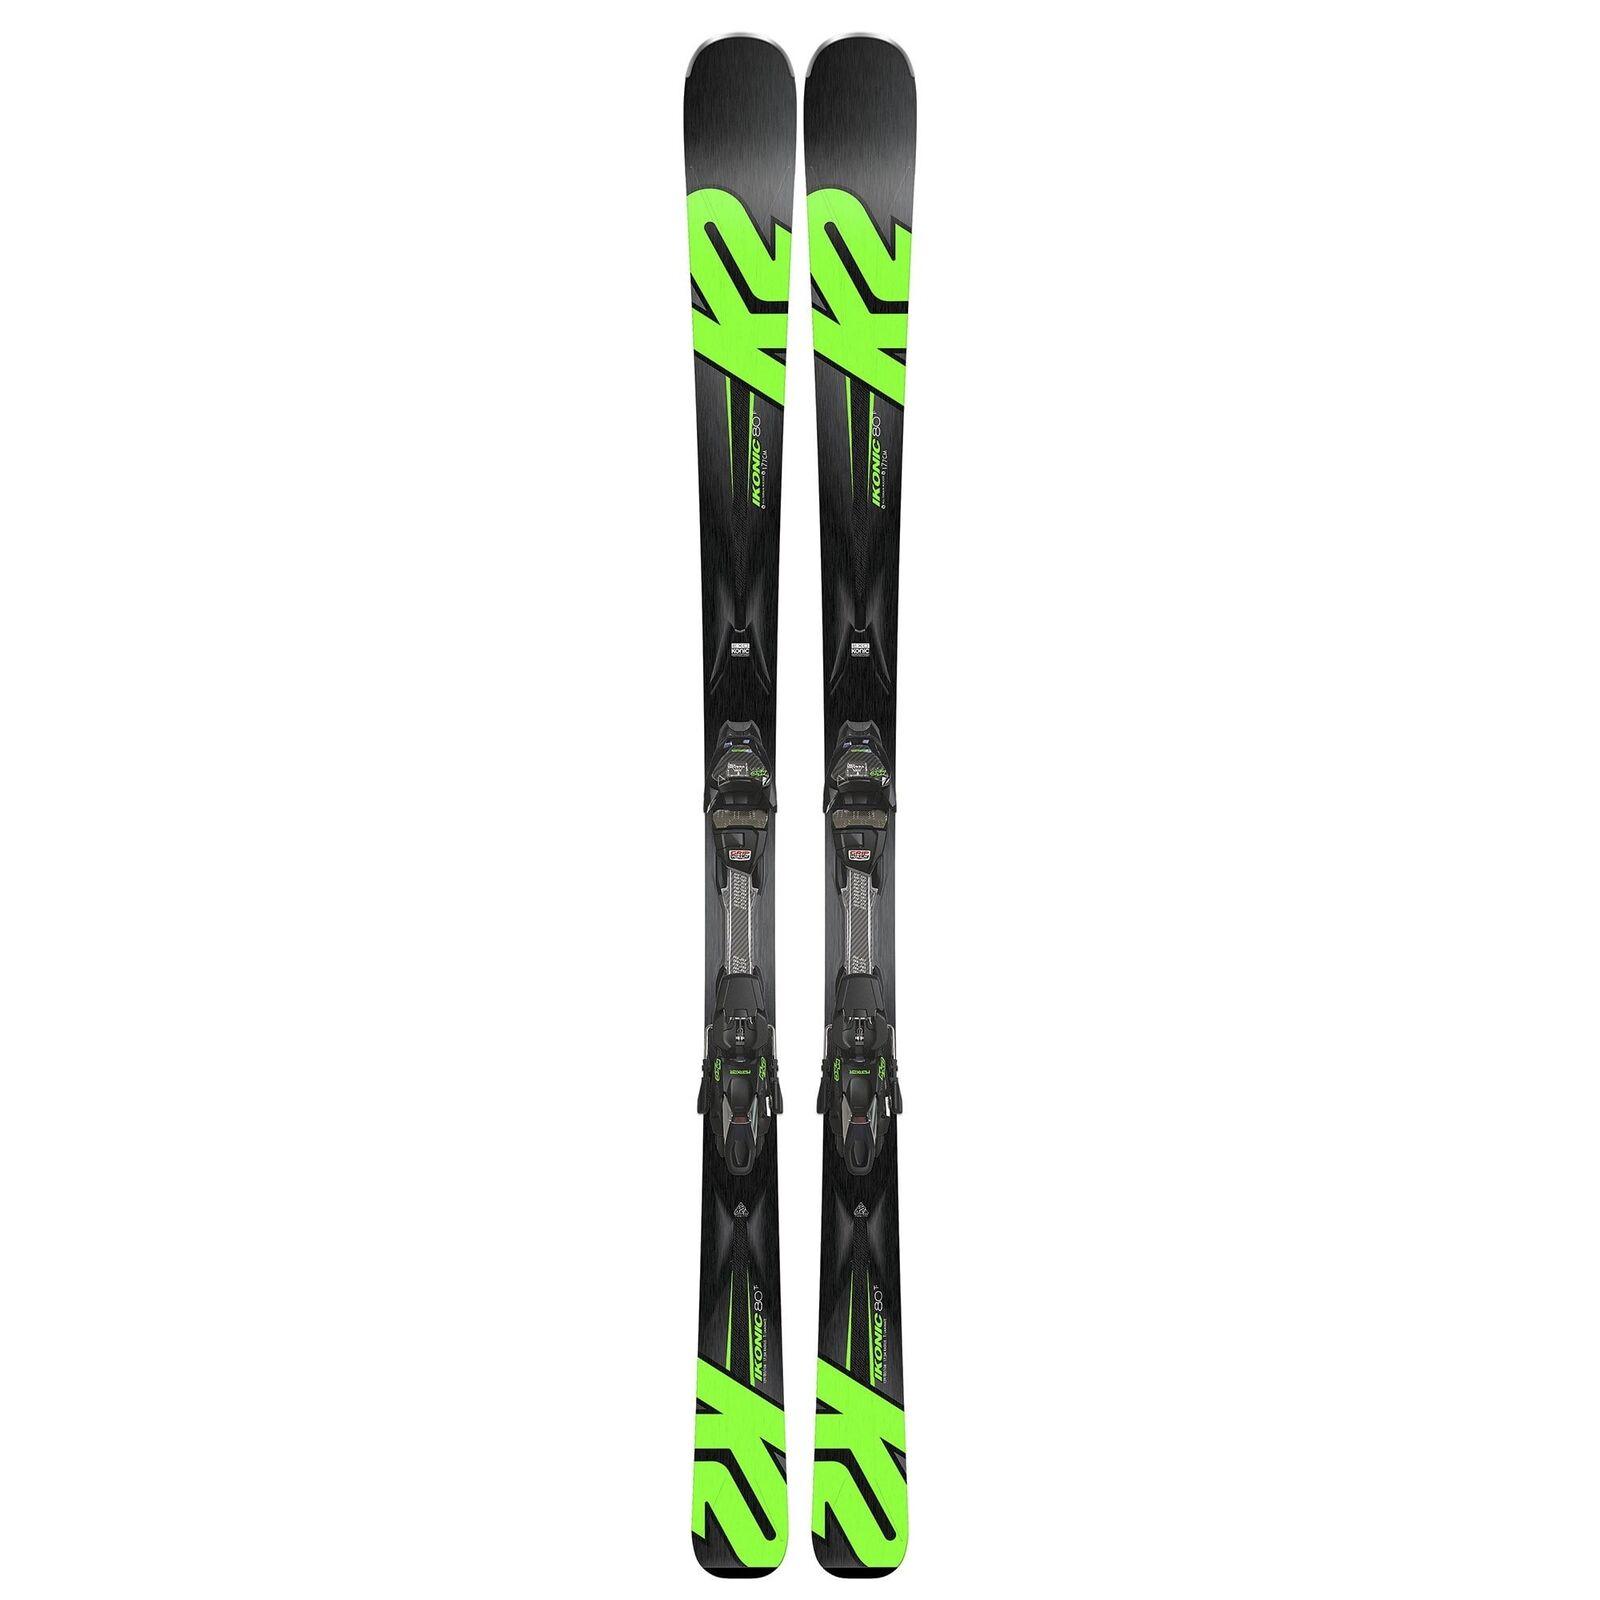 Recreational K2 1426058 K2 Recreational iKonic 80 Ti Ski + MXC 12 TCx Light bindings - 170cm 2f4424